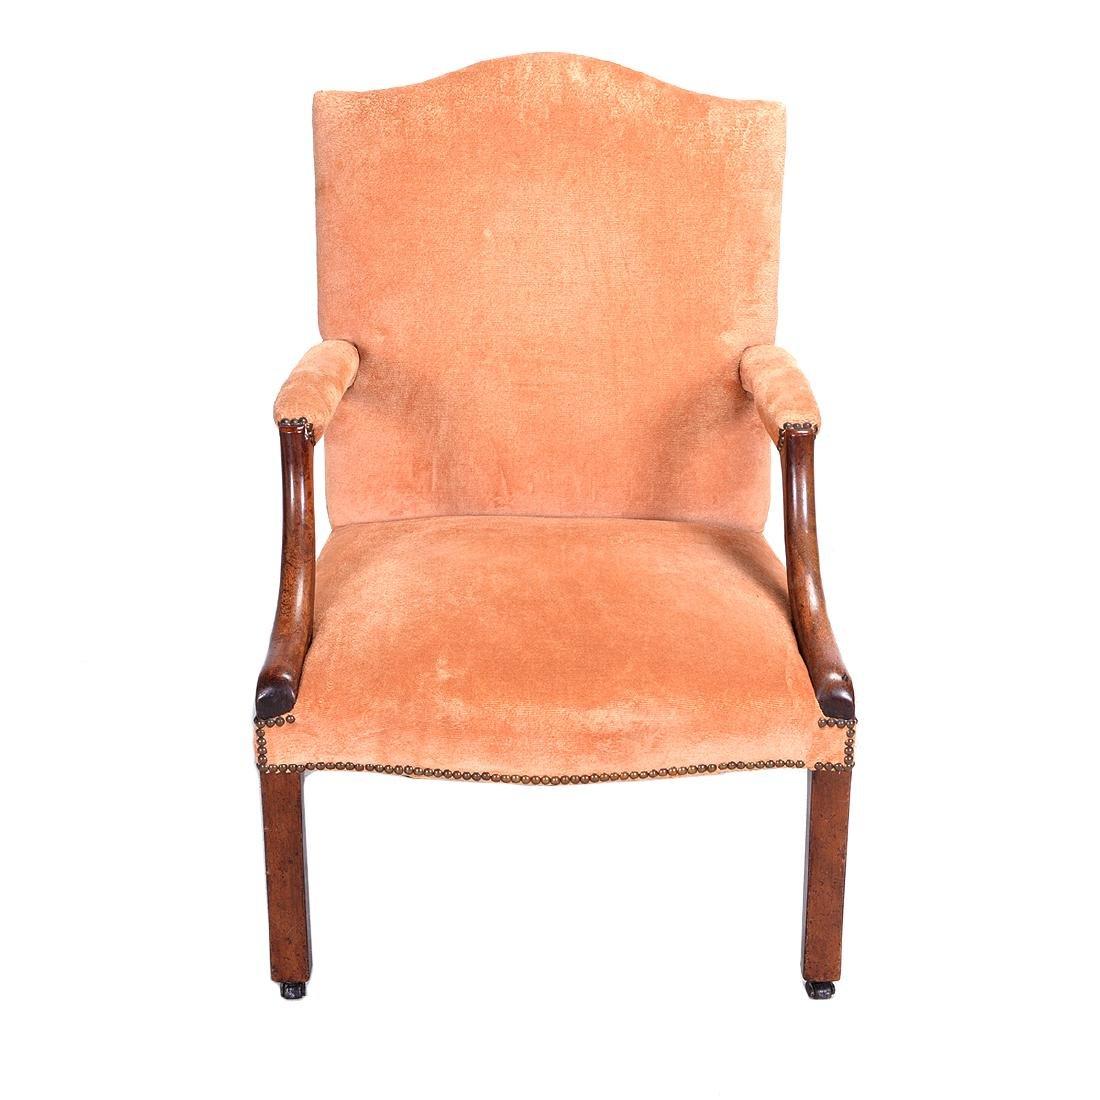 George III Mahogany Upholstered Open Armchair - 4